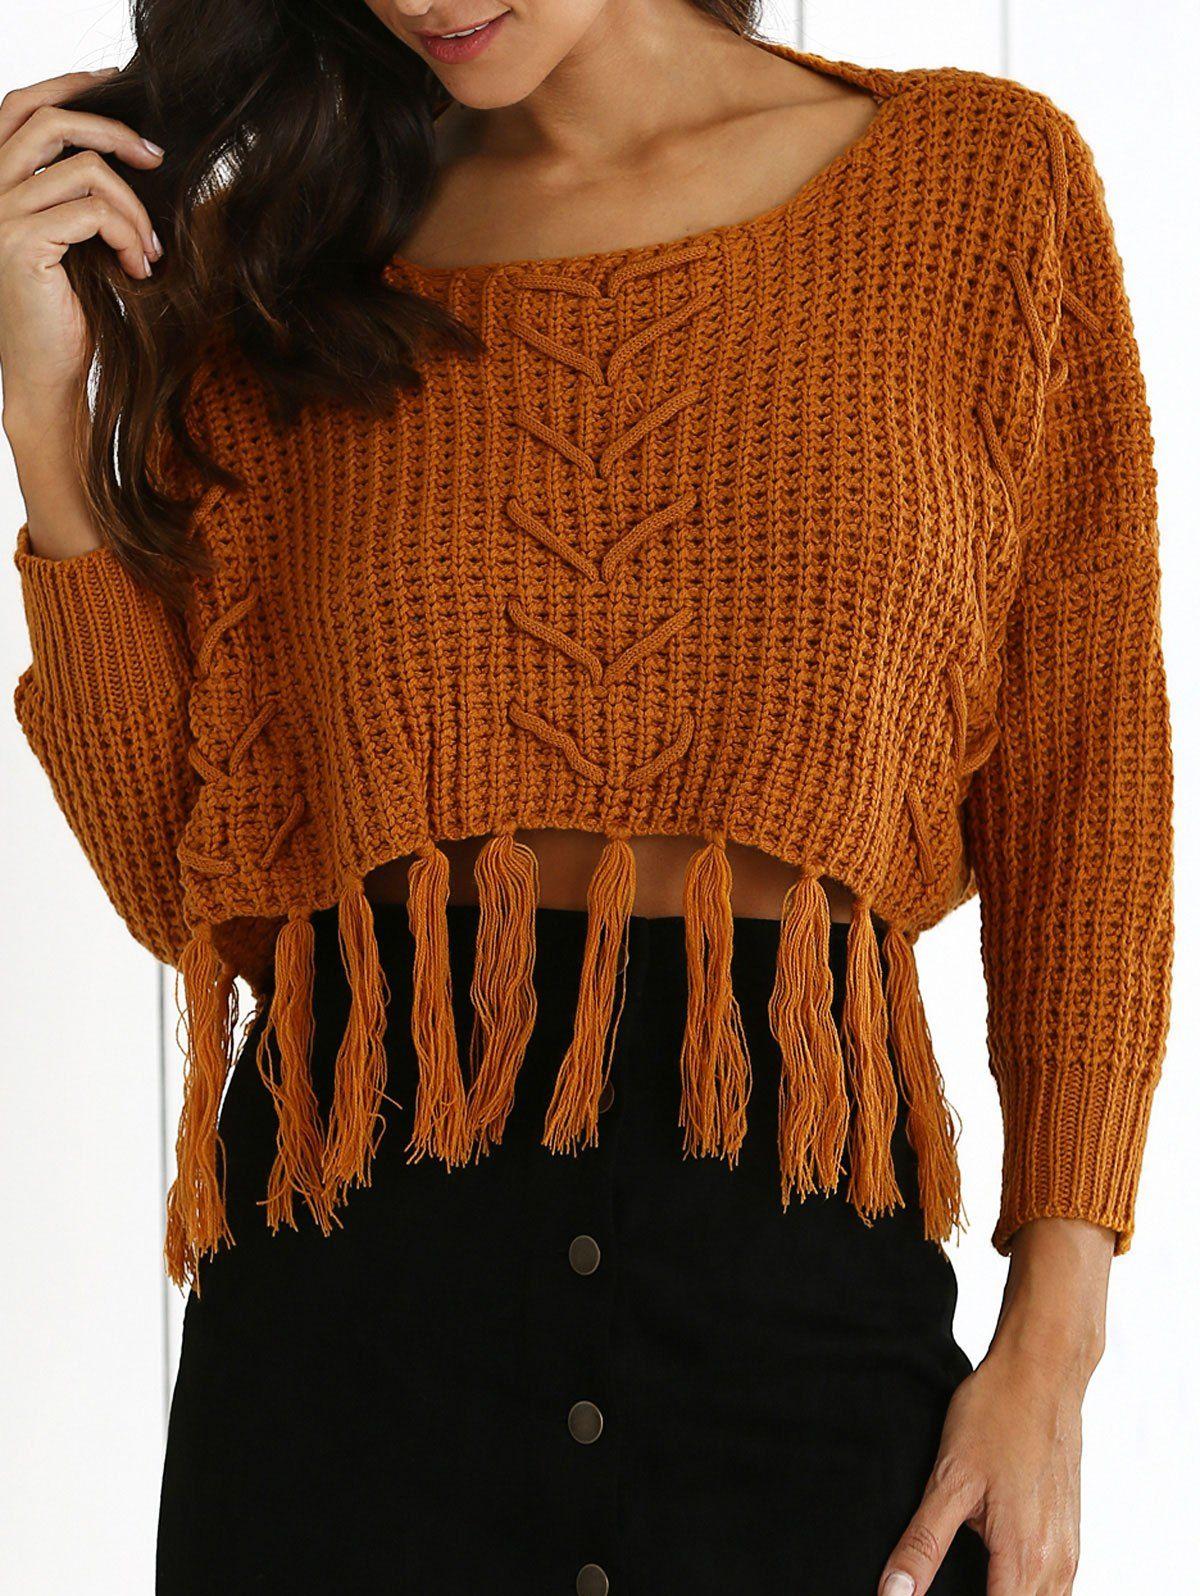 Sweaters & Cardigans | Earthy Scoop Neck Tassels High Low Hem ...